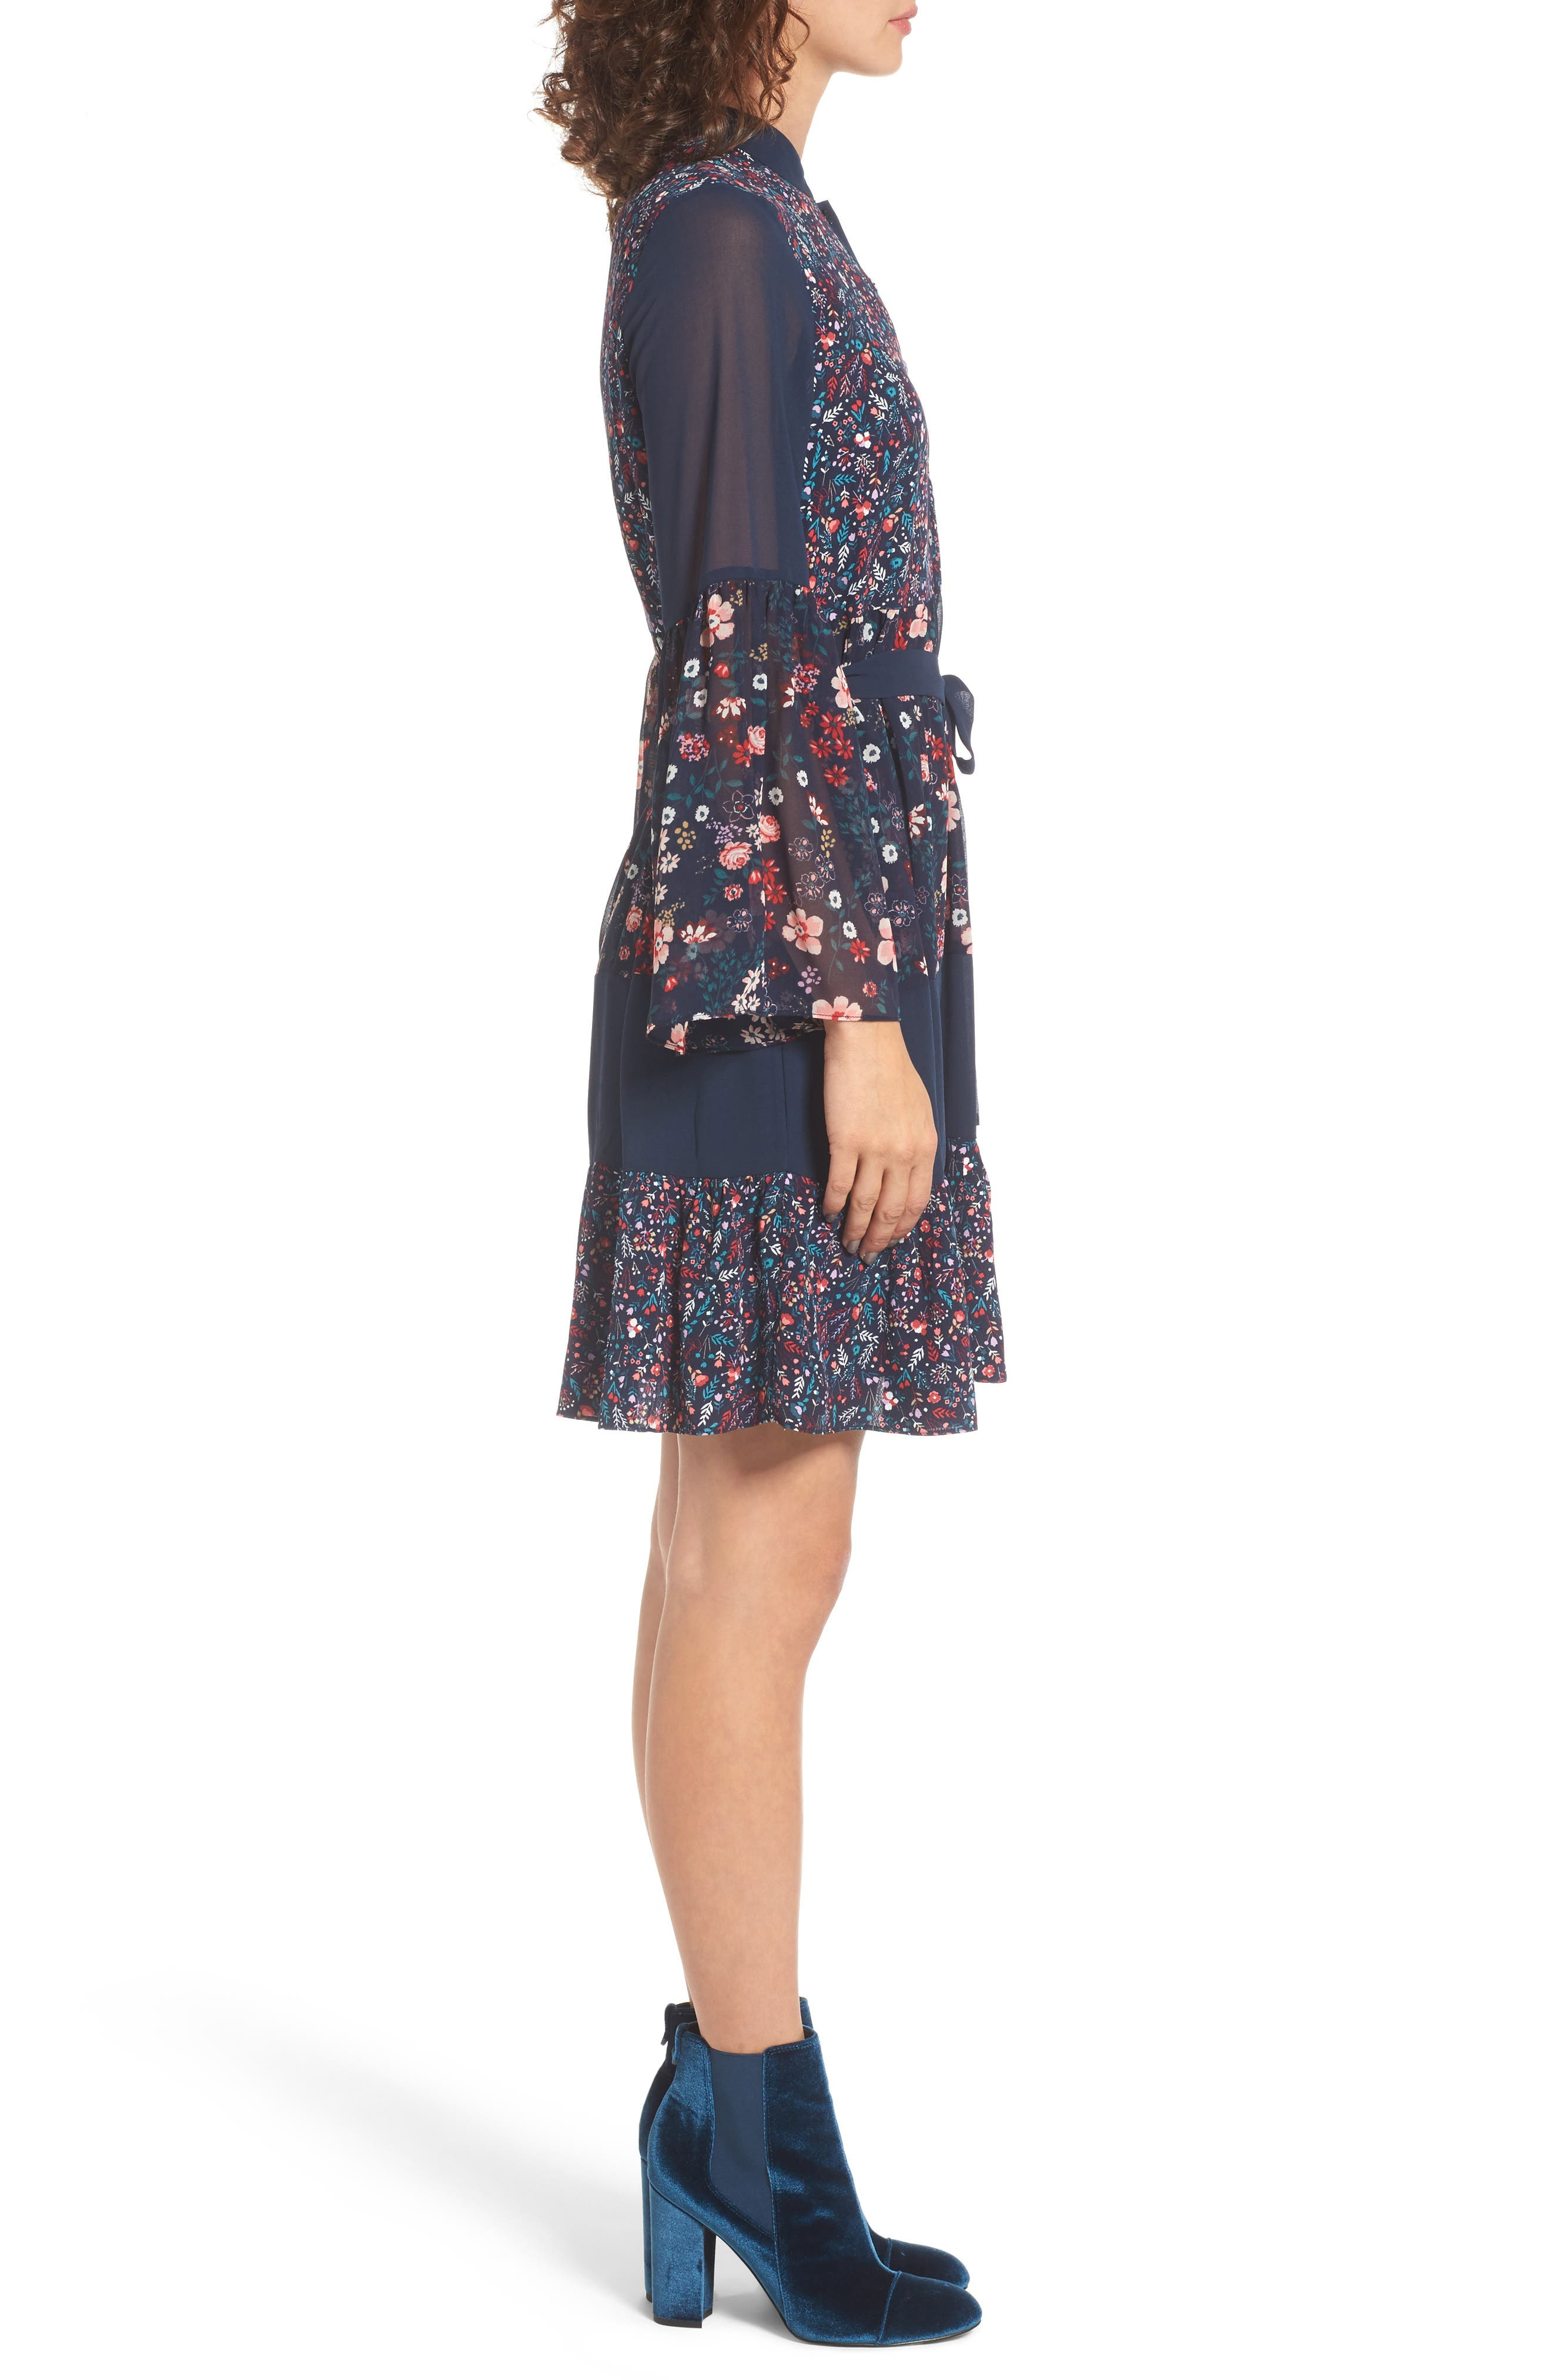 Caprice Floral Mix Shirtdress,                             Alternate thumbnail 3, color,                             497